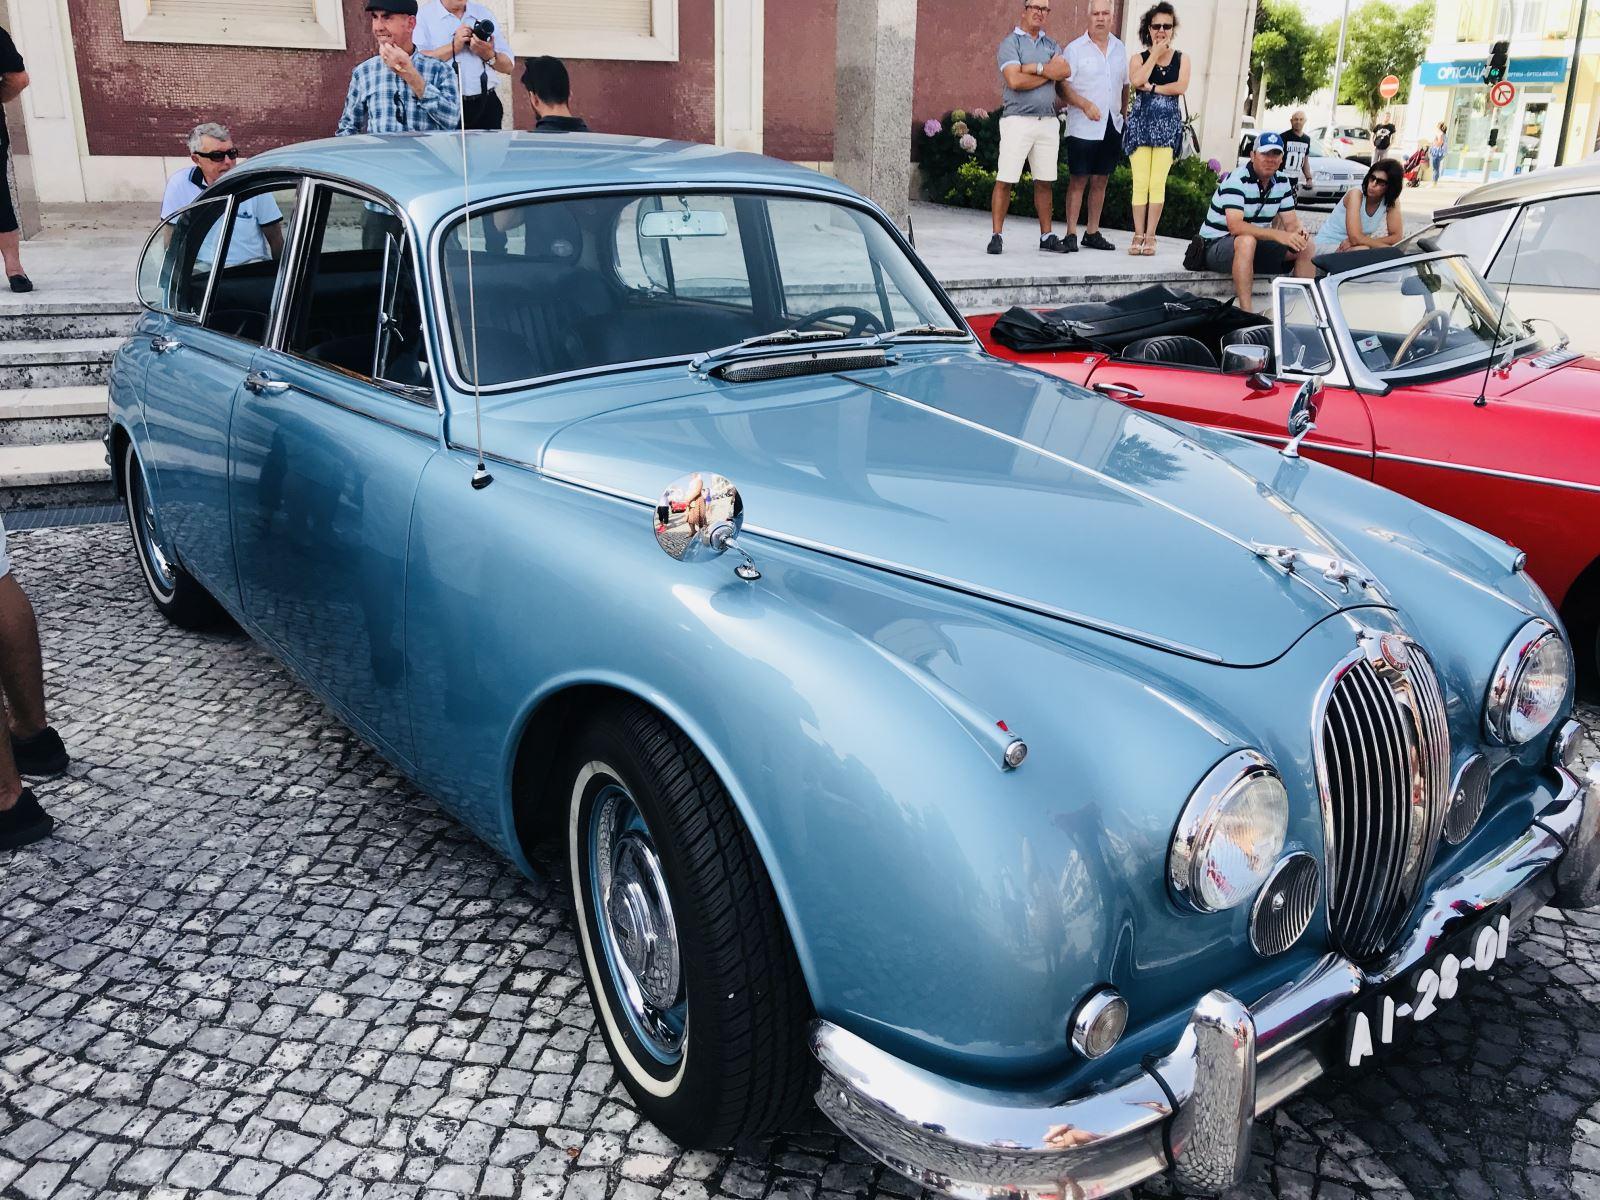 Carros antigos percorreram  ruas de Vagos